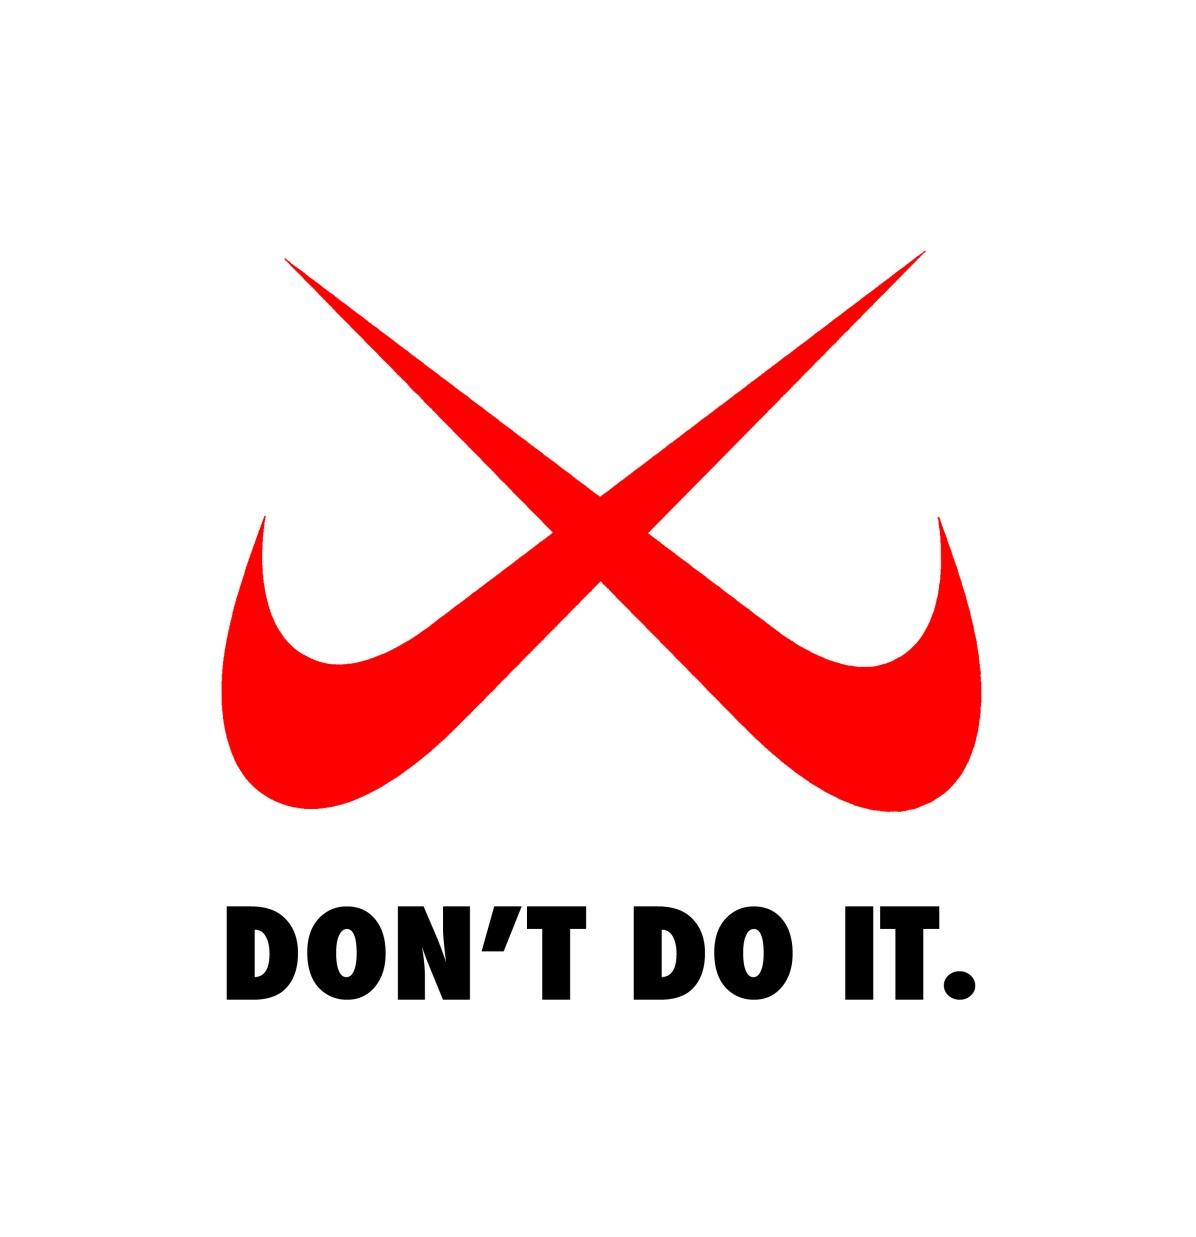 #ProjectVandalEyes says, don't vandalise!